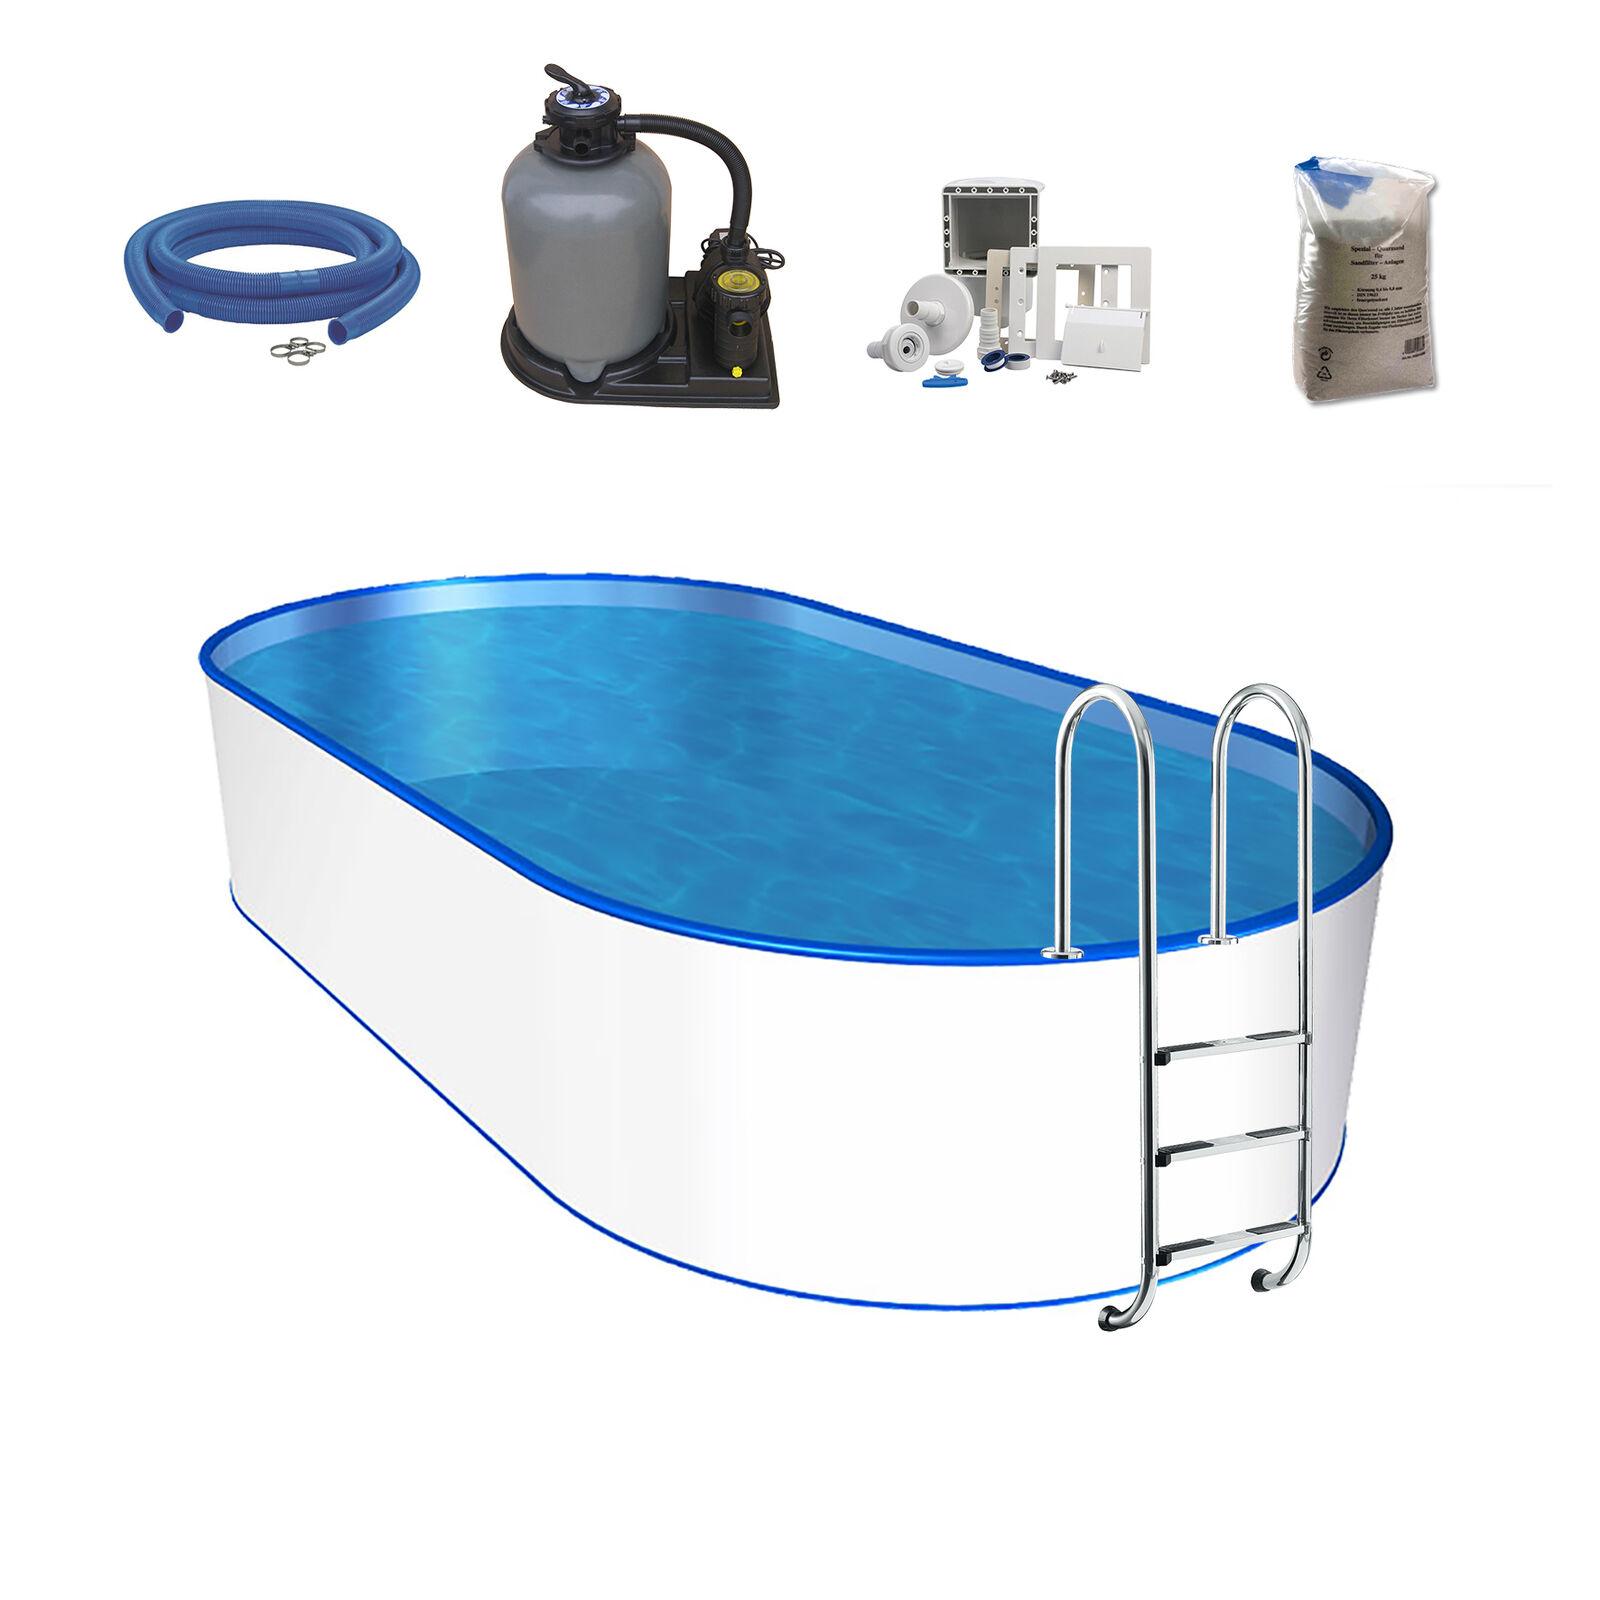 Oval-Pool-Set, Größe & Tiefe wählbar, 0,6mm Stahlwand, 0,6mm Poolfolie mit Einhä